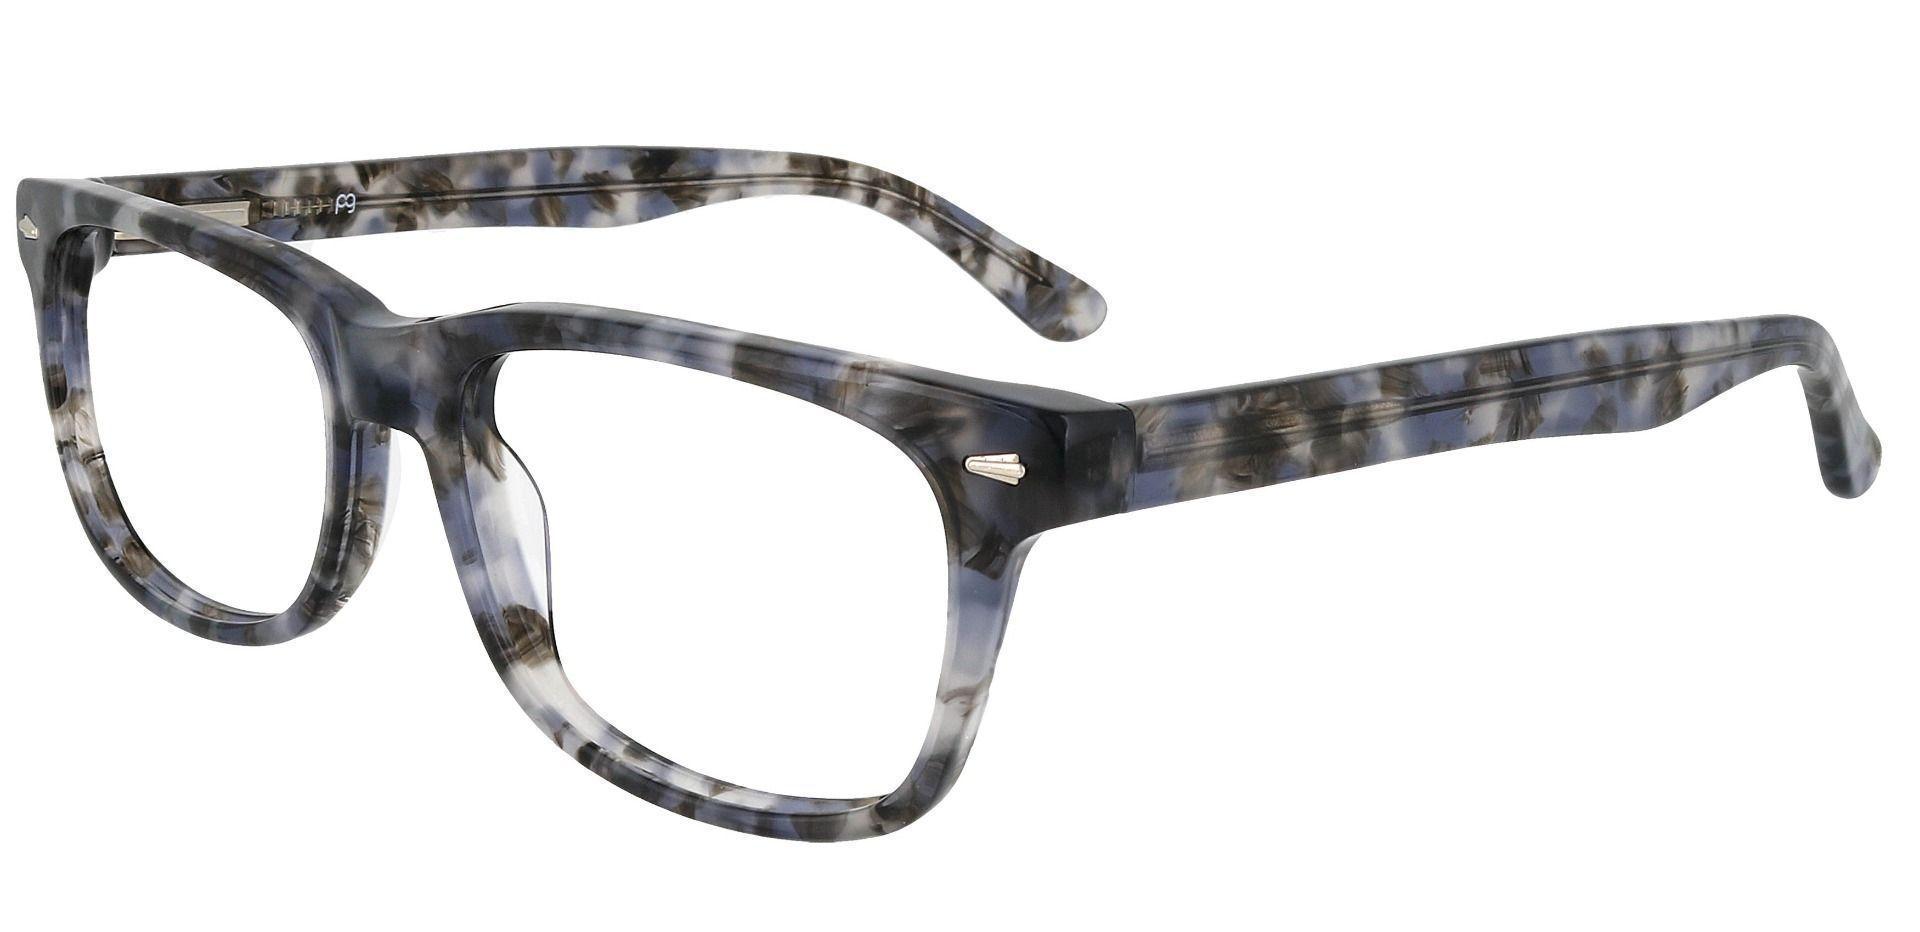 Hendrix Rectangle Lined Bifocal Glasses - Floral